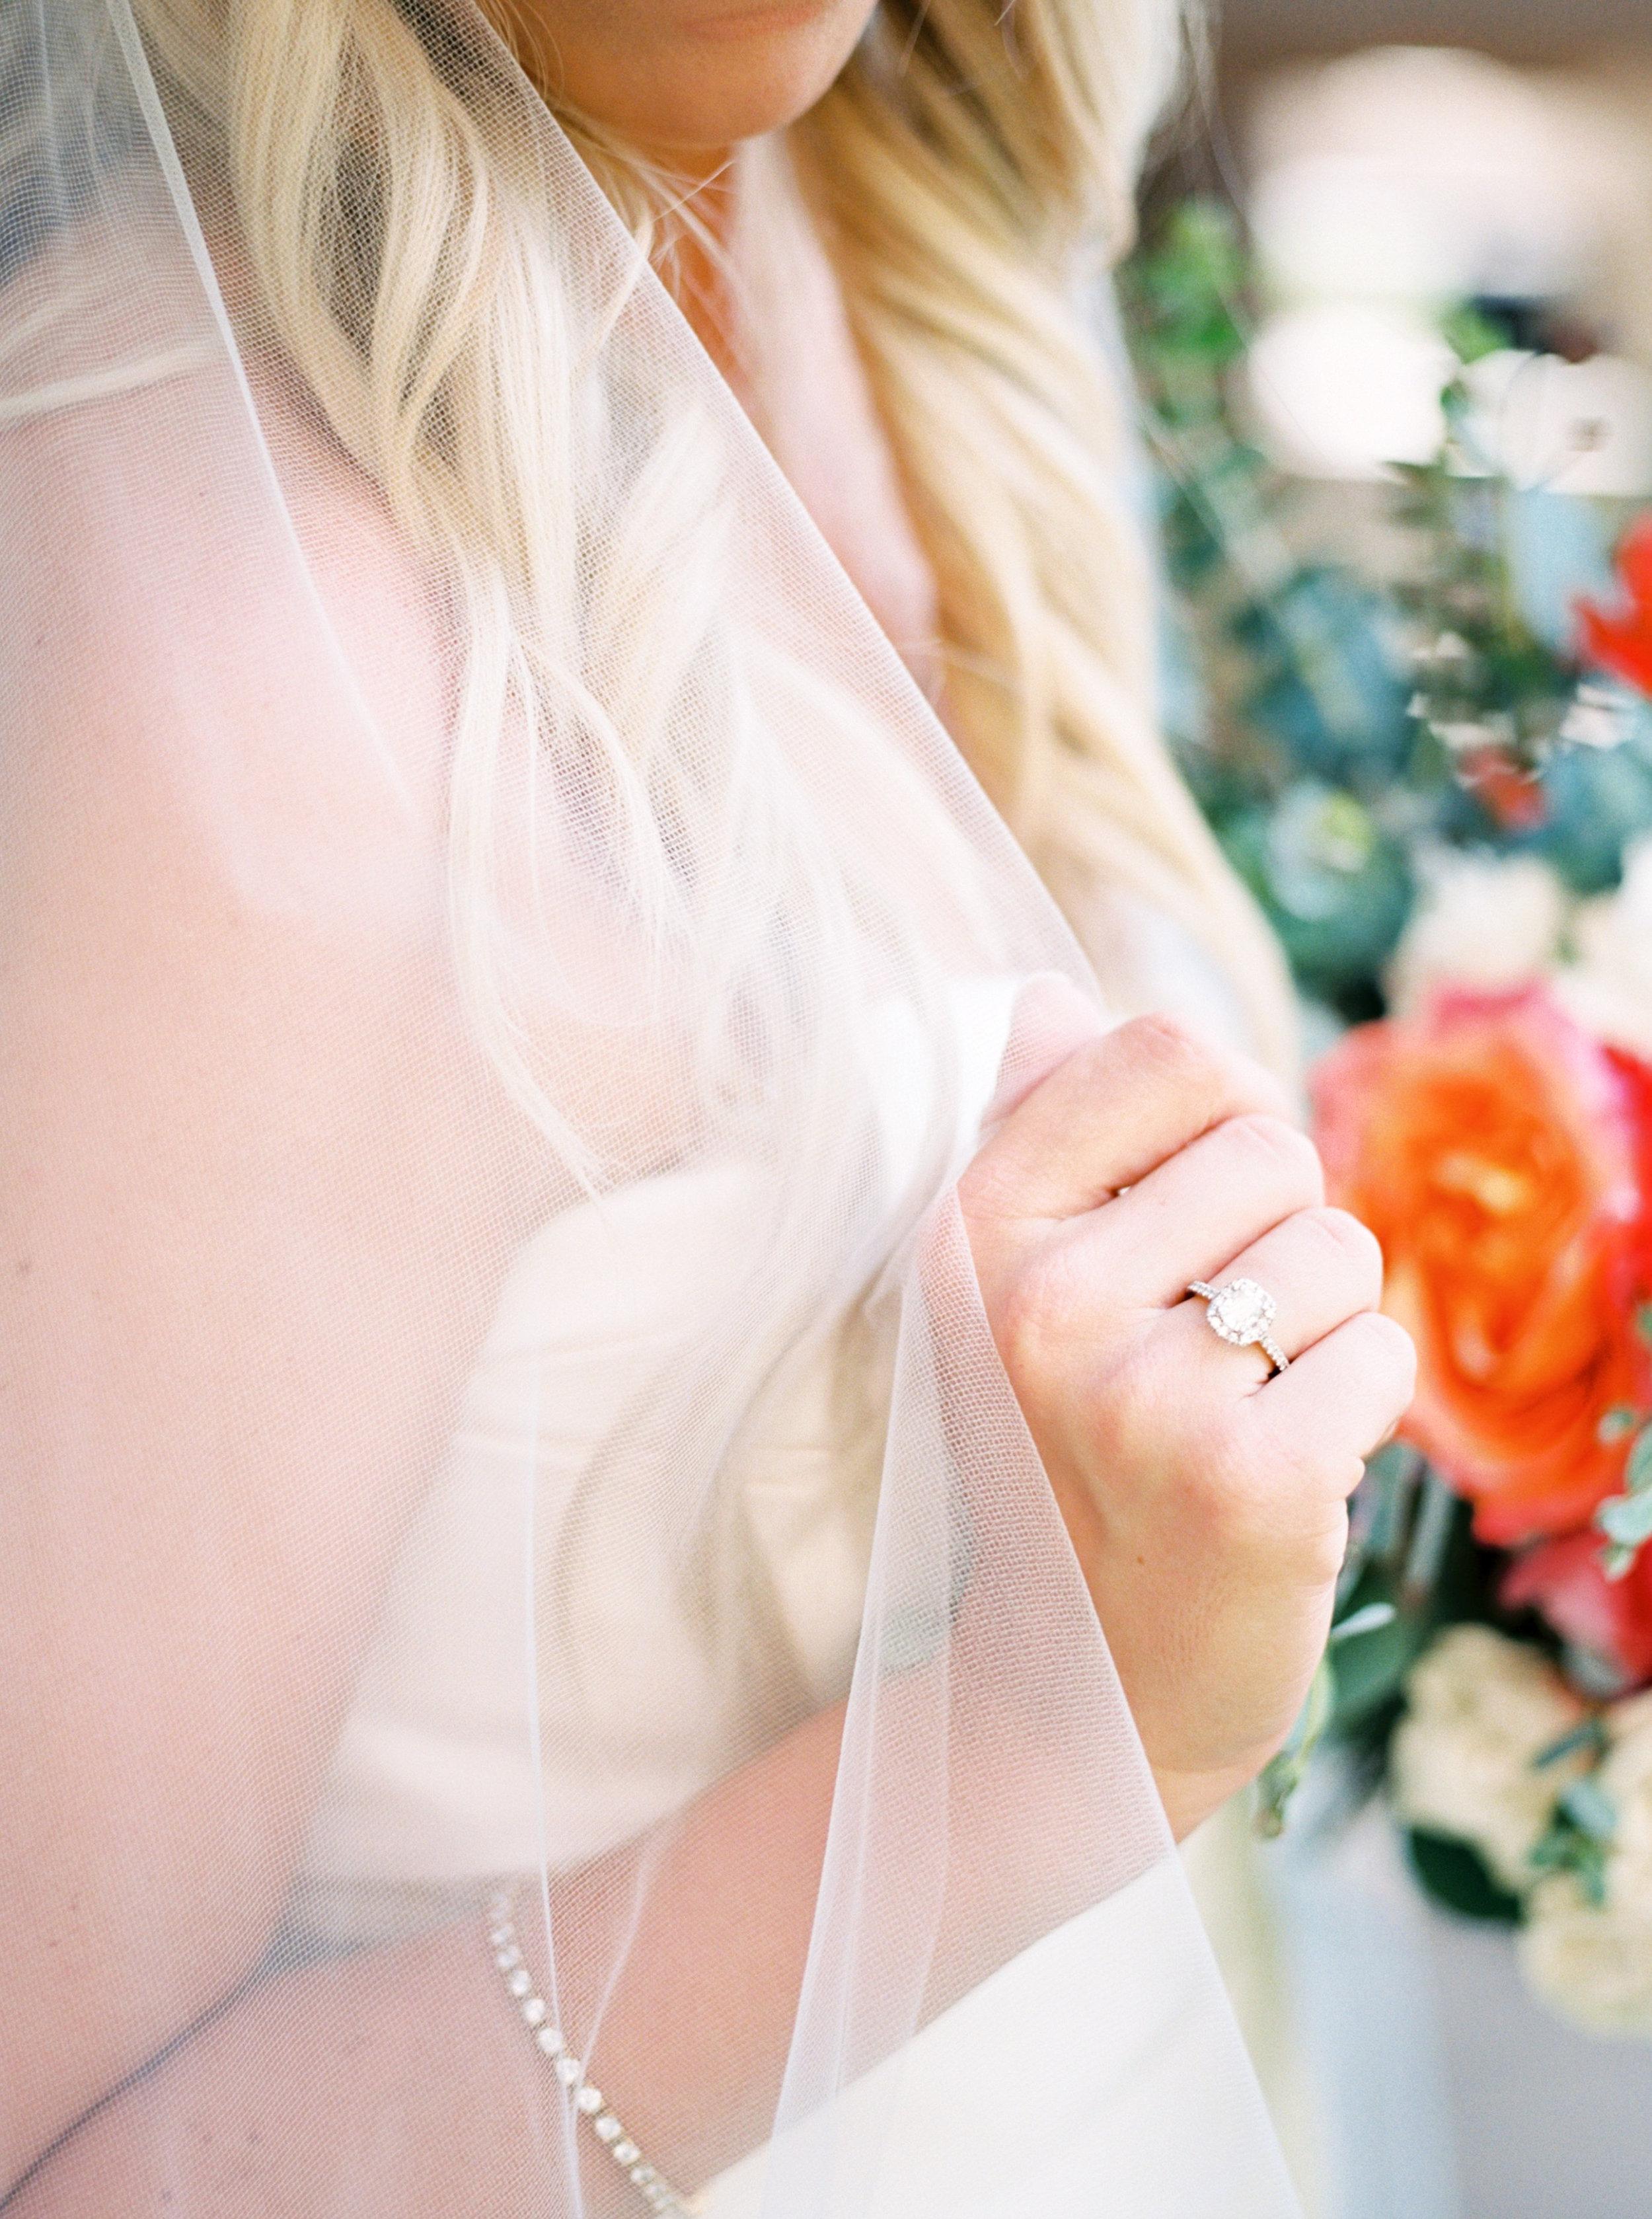 Bride details, bridal veil, engagement ring, bridal bouquet, coral wedding flowers, orange wedding flowers, blush wedding flowers